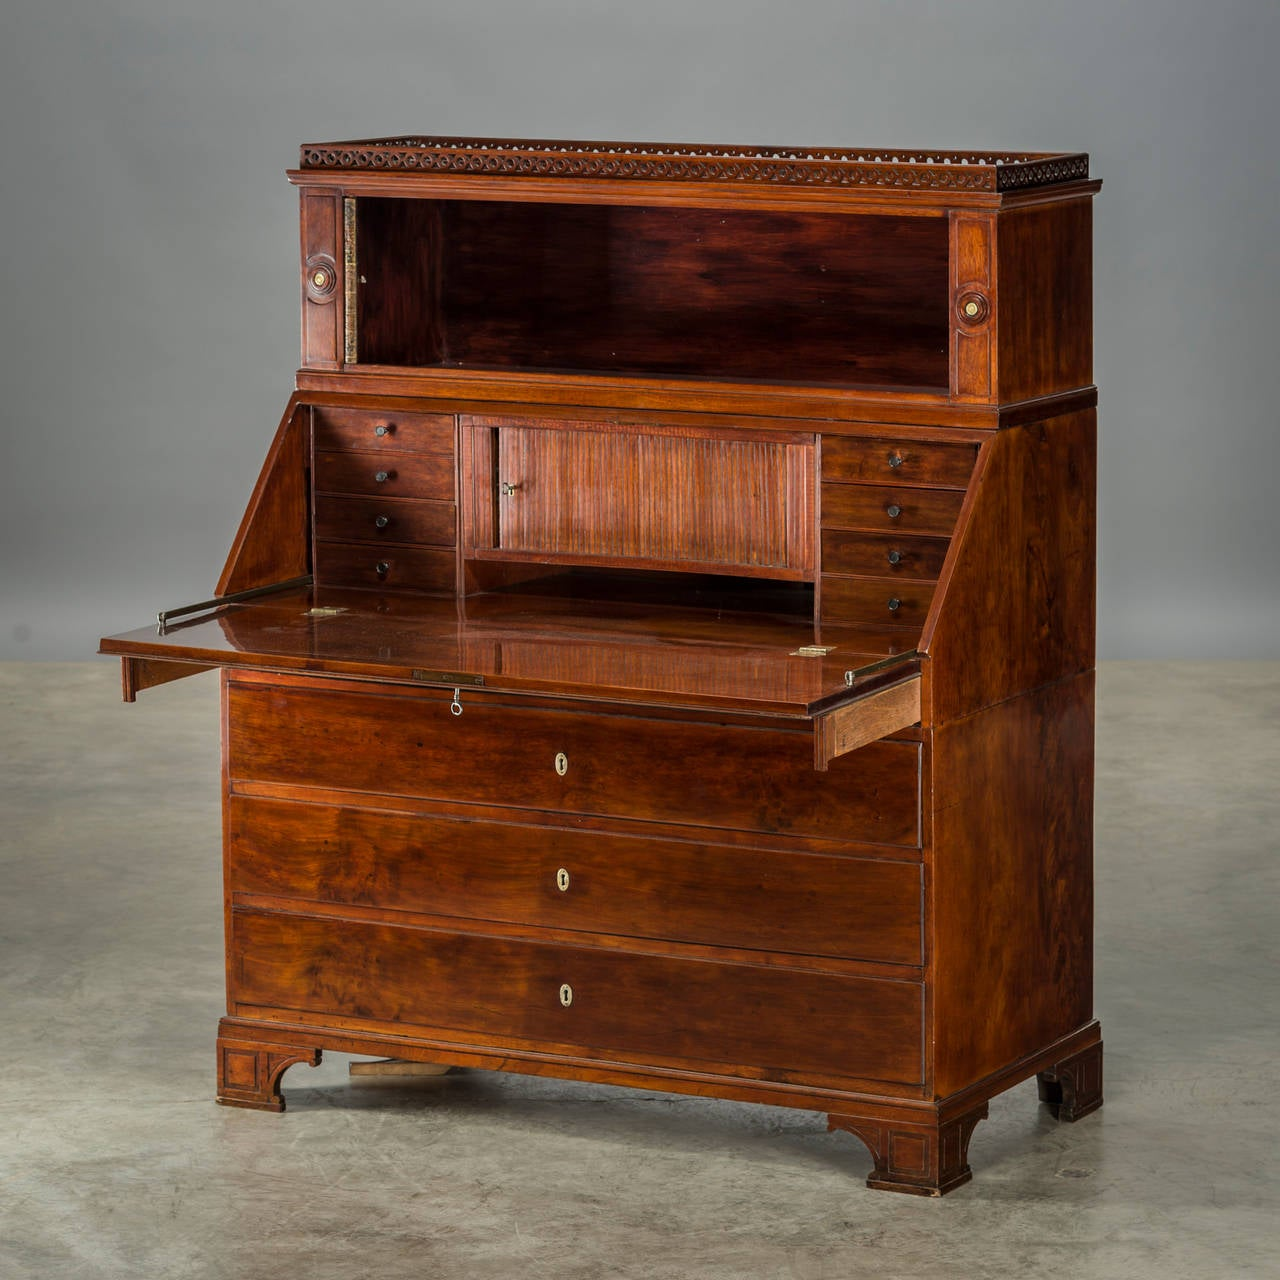 louis xvi bureau copenhagen circa 1780 at 1stdibs. Black Bedroom Furniture Sets. Home Design Ideas